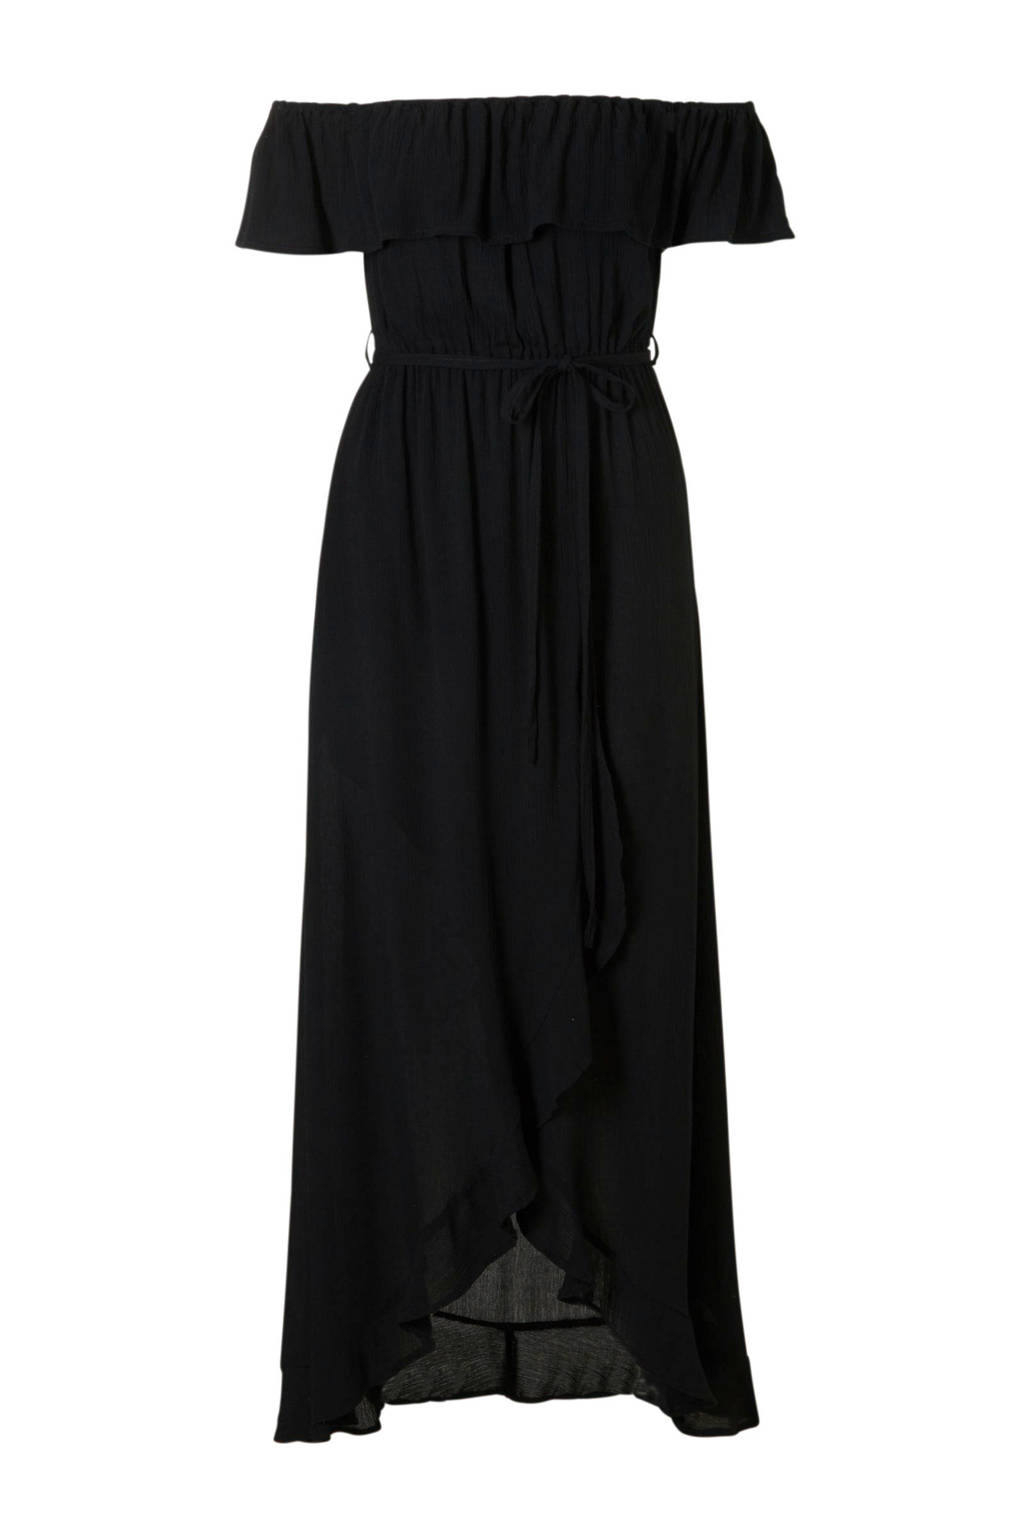 River Island jurk met volant, Zwart